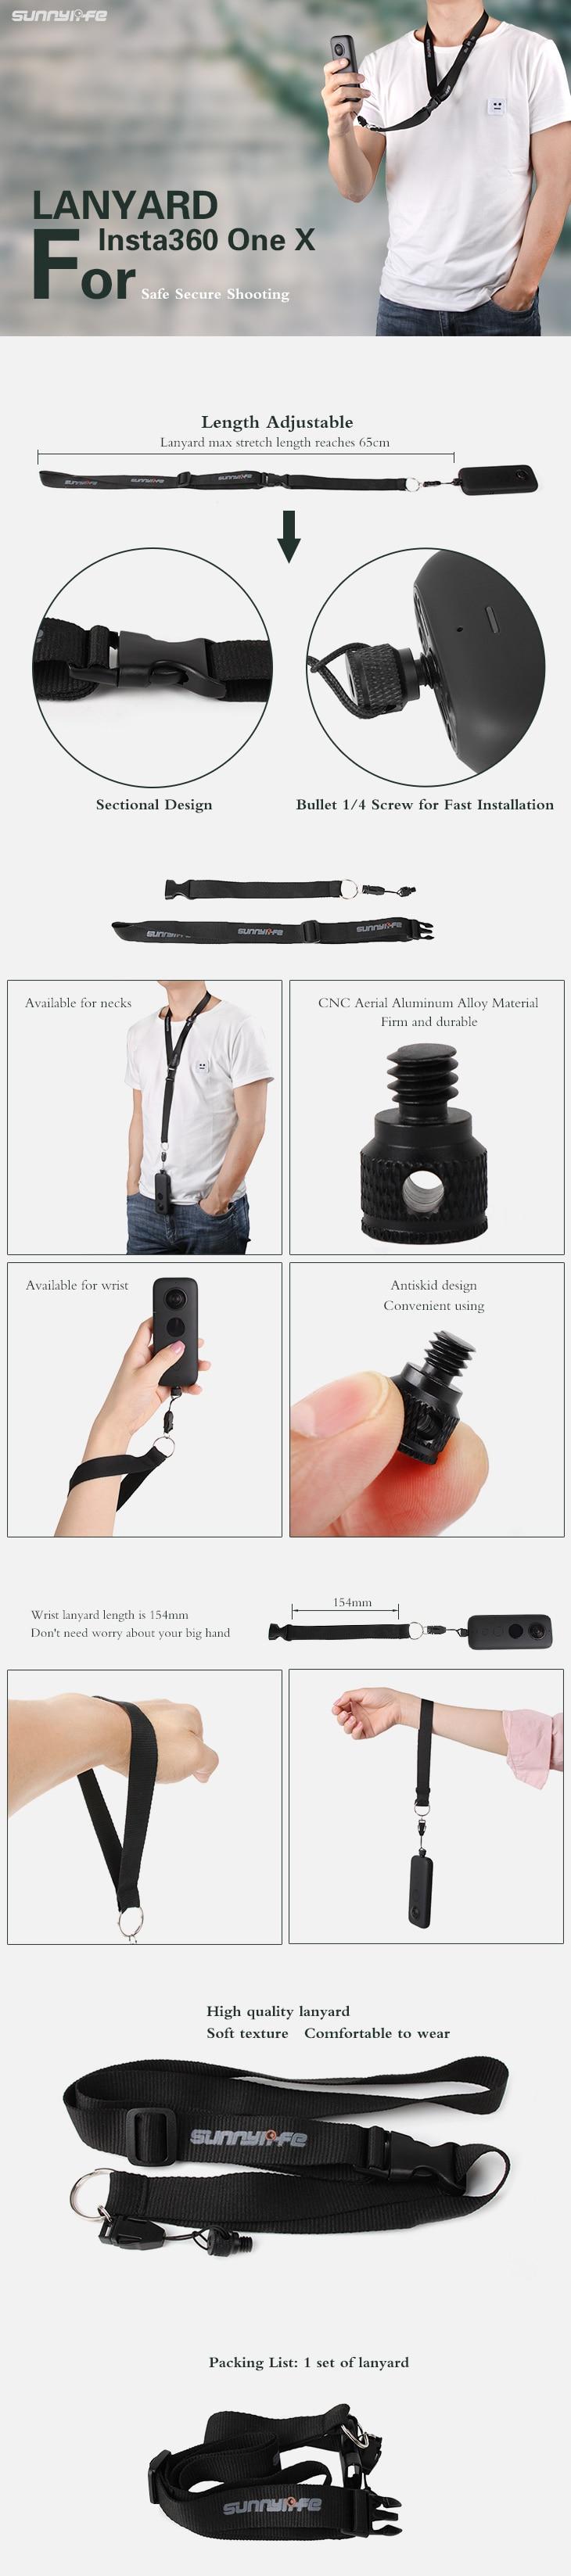 Liobaba Wrist Lanyard Camera Strap Grip Adjustable Weave for DSLR Camera Photography Accessories Digital Camera Wrist Strap